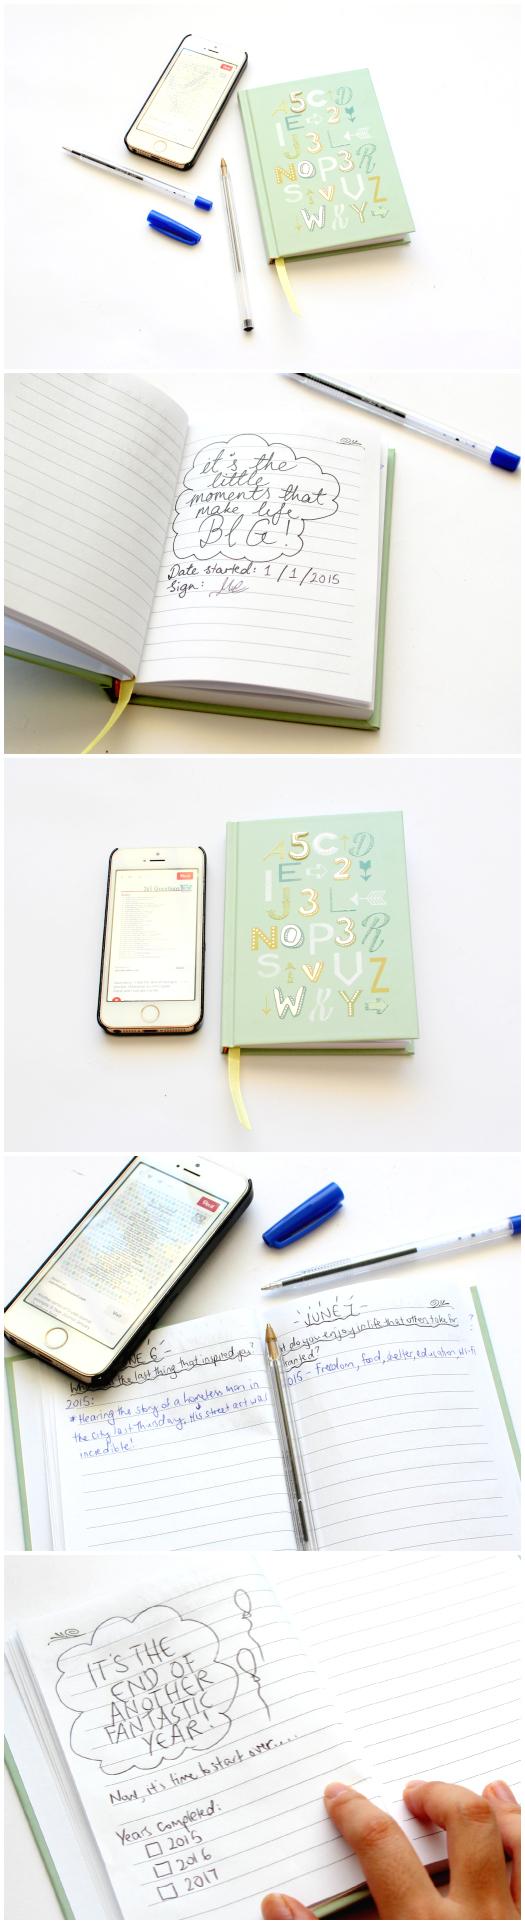 DIY Kikki.k Inspired 3 Year Journal By Miss Caly